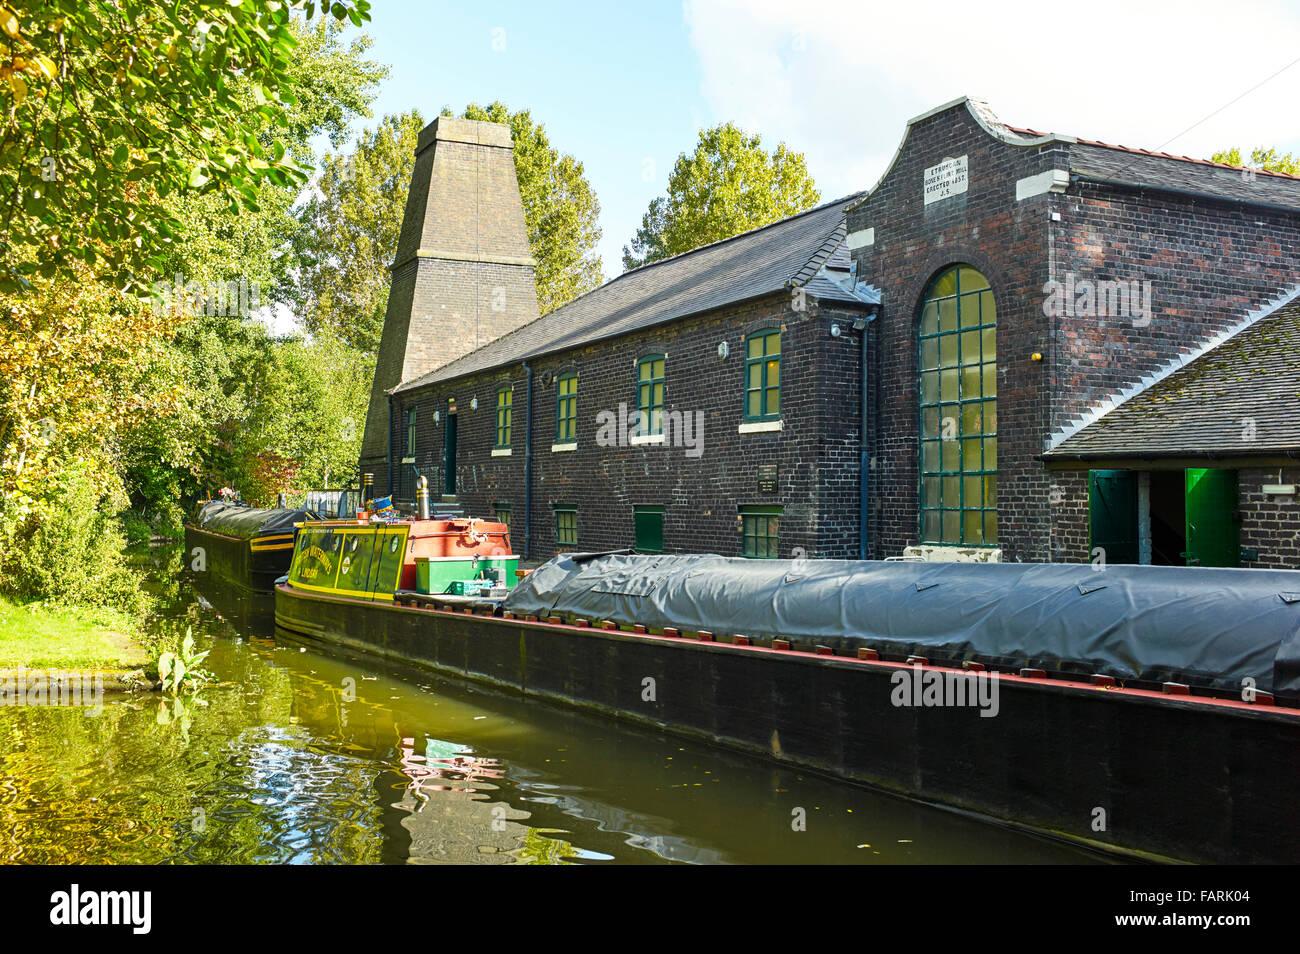 Flint mill at Stoke on Trent - Stock Image